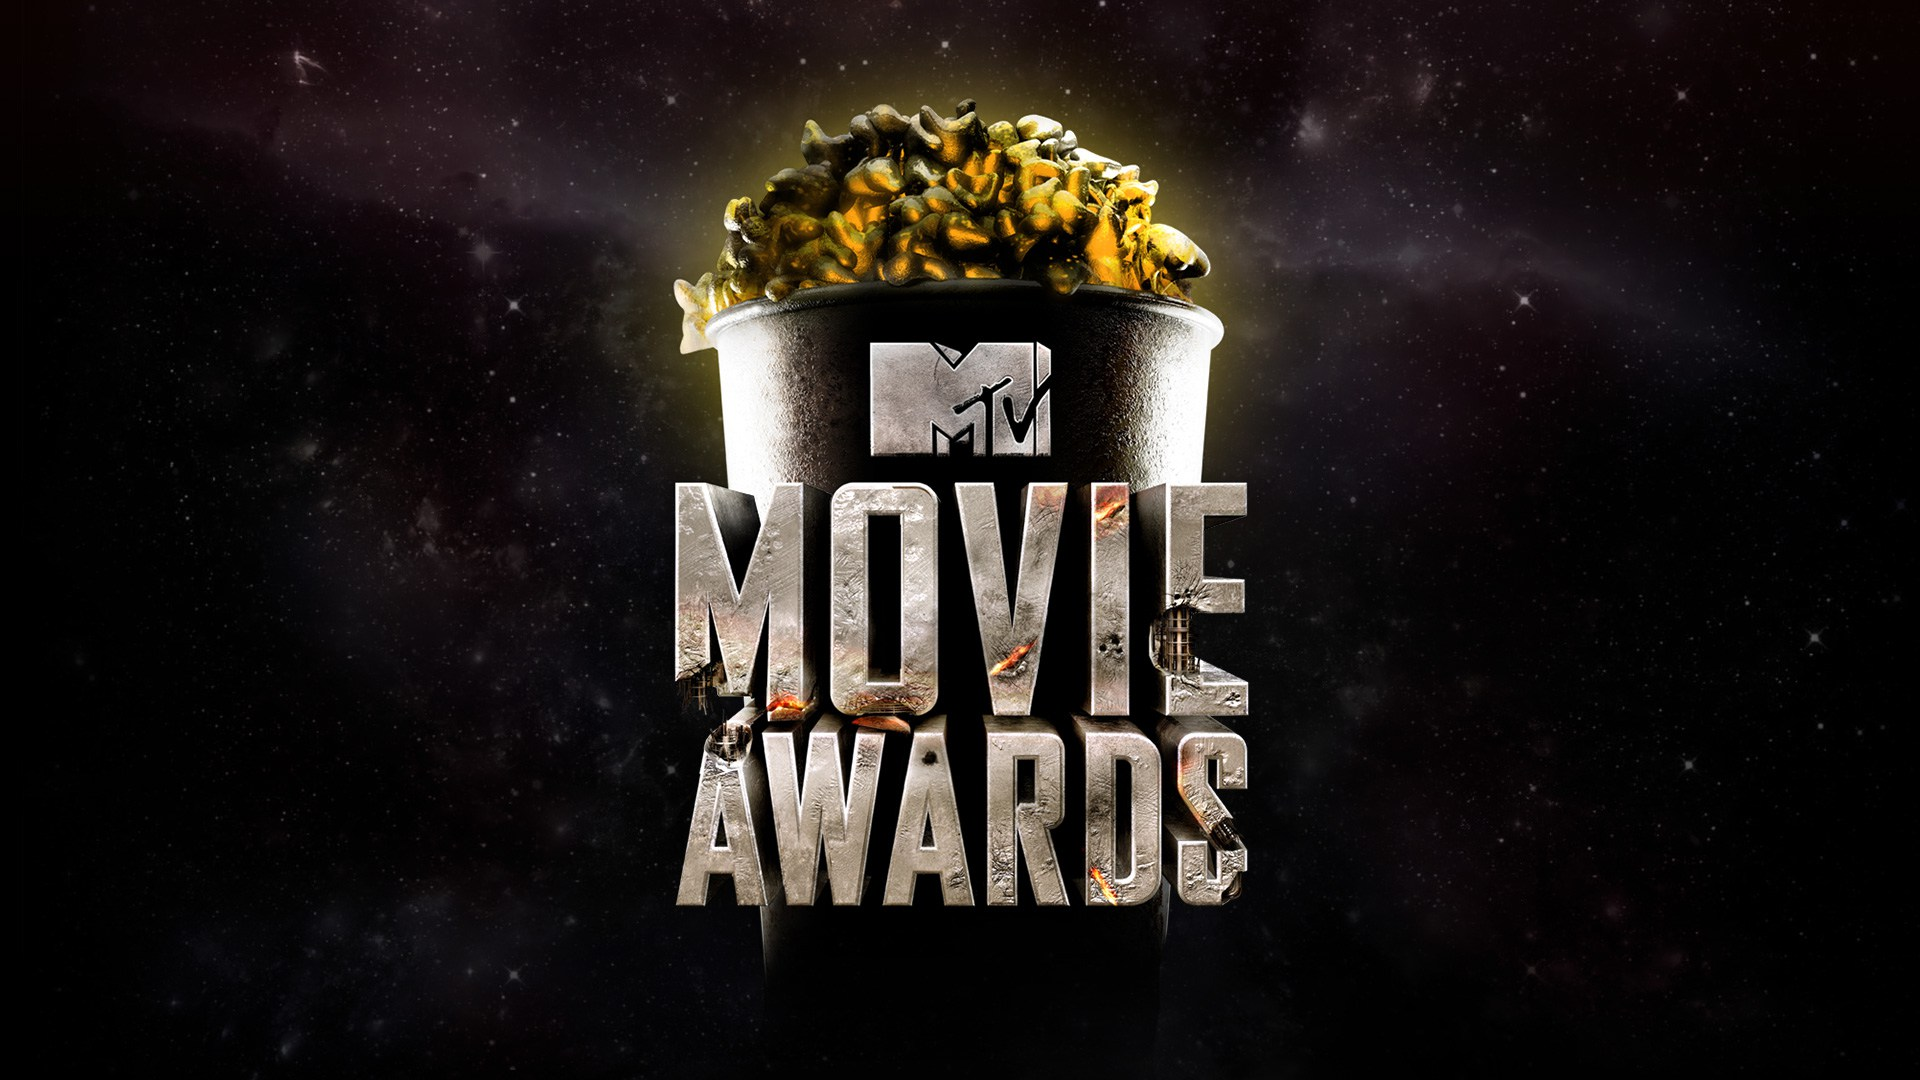 mtv-movie-awards-turn-25-this-year-02.jpg